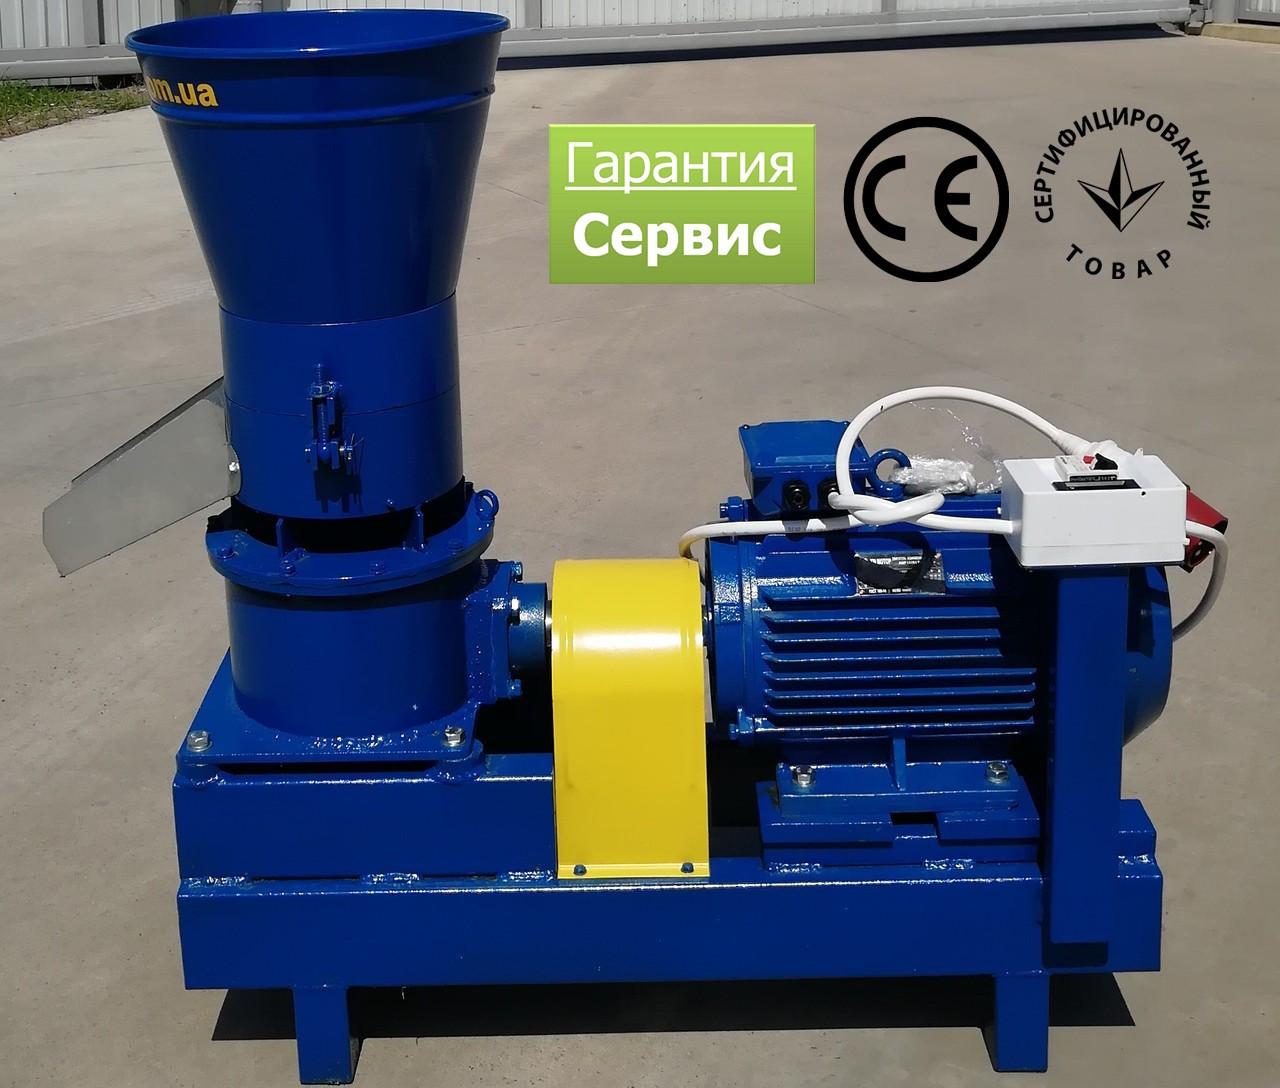 Гранулятор корма Артмаш 380 В,11 кВт, 1000 об/мин без двигателя